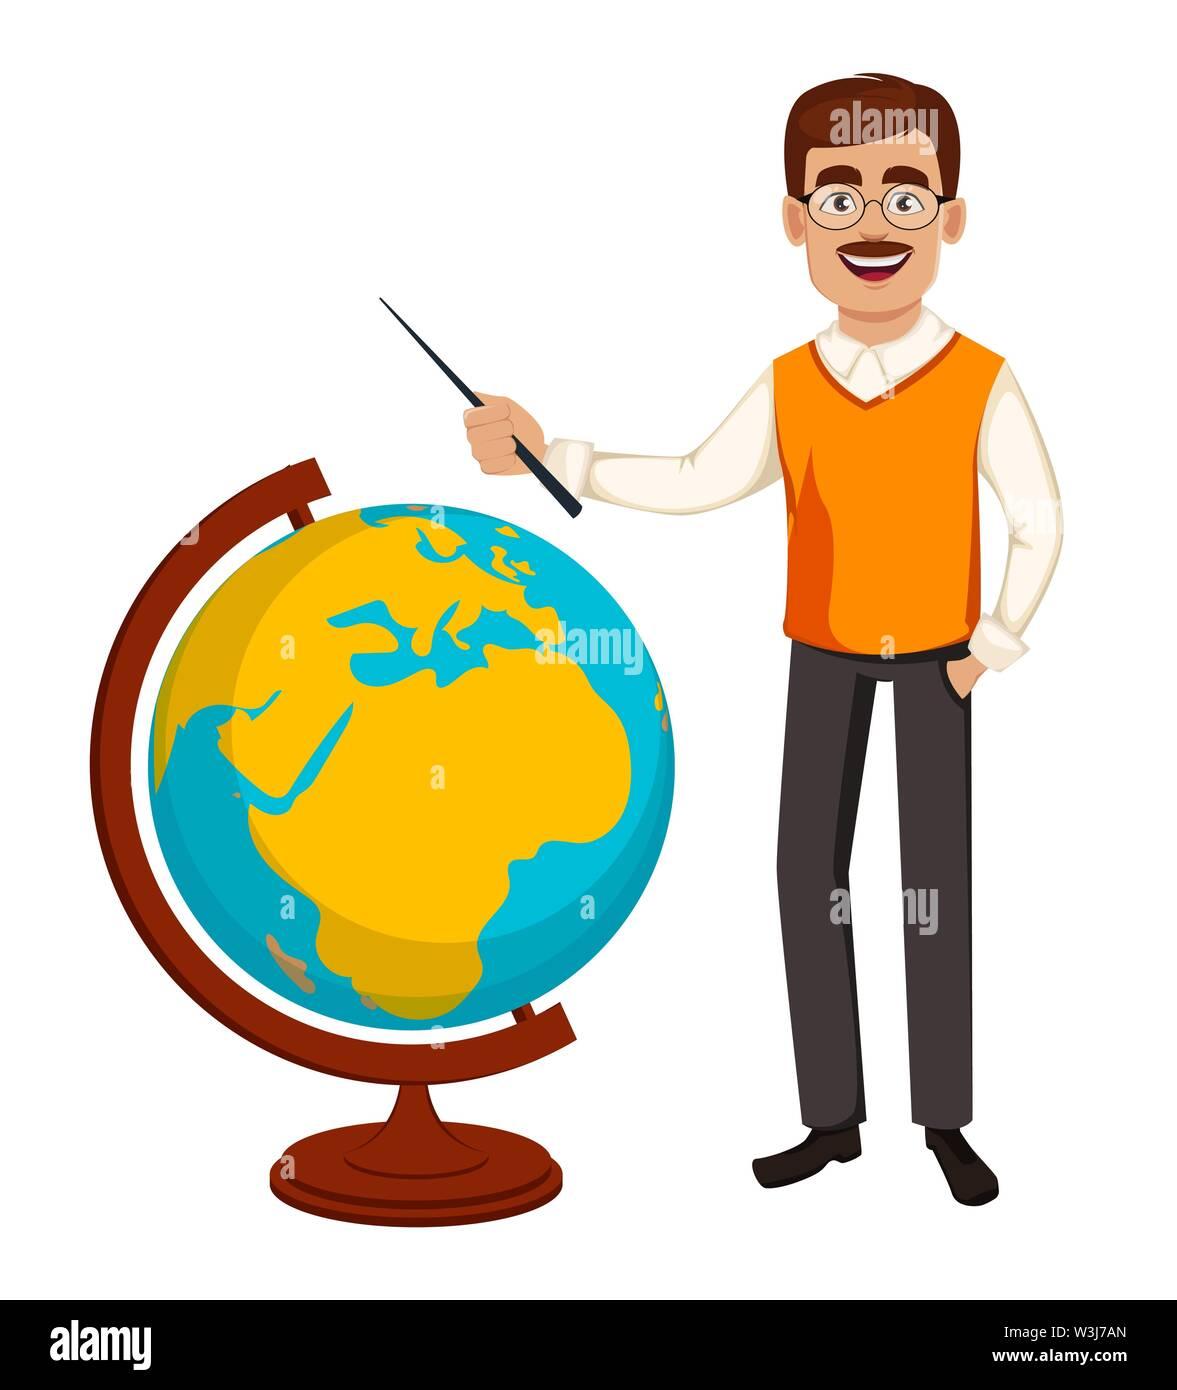 Back to school. Teacher man cartoon character stands near globe. Teacher's day. Vector illustration - Stock Image